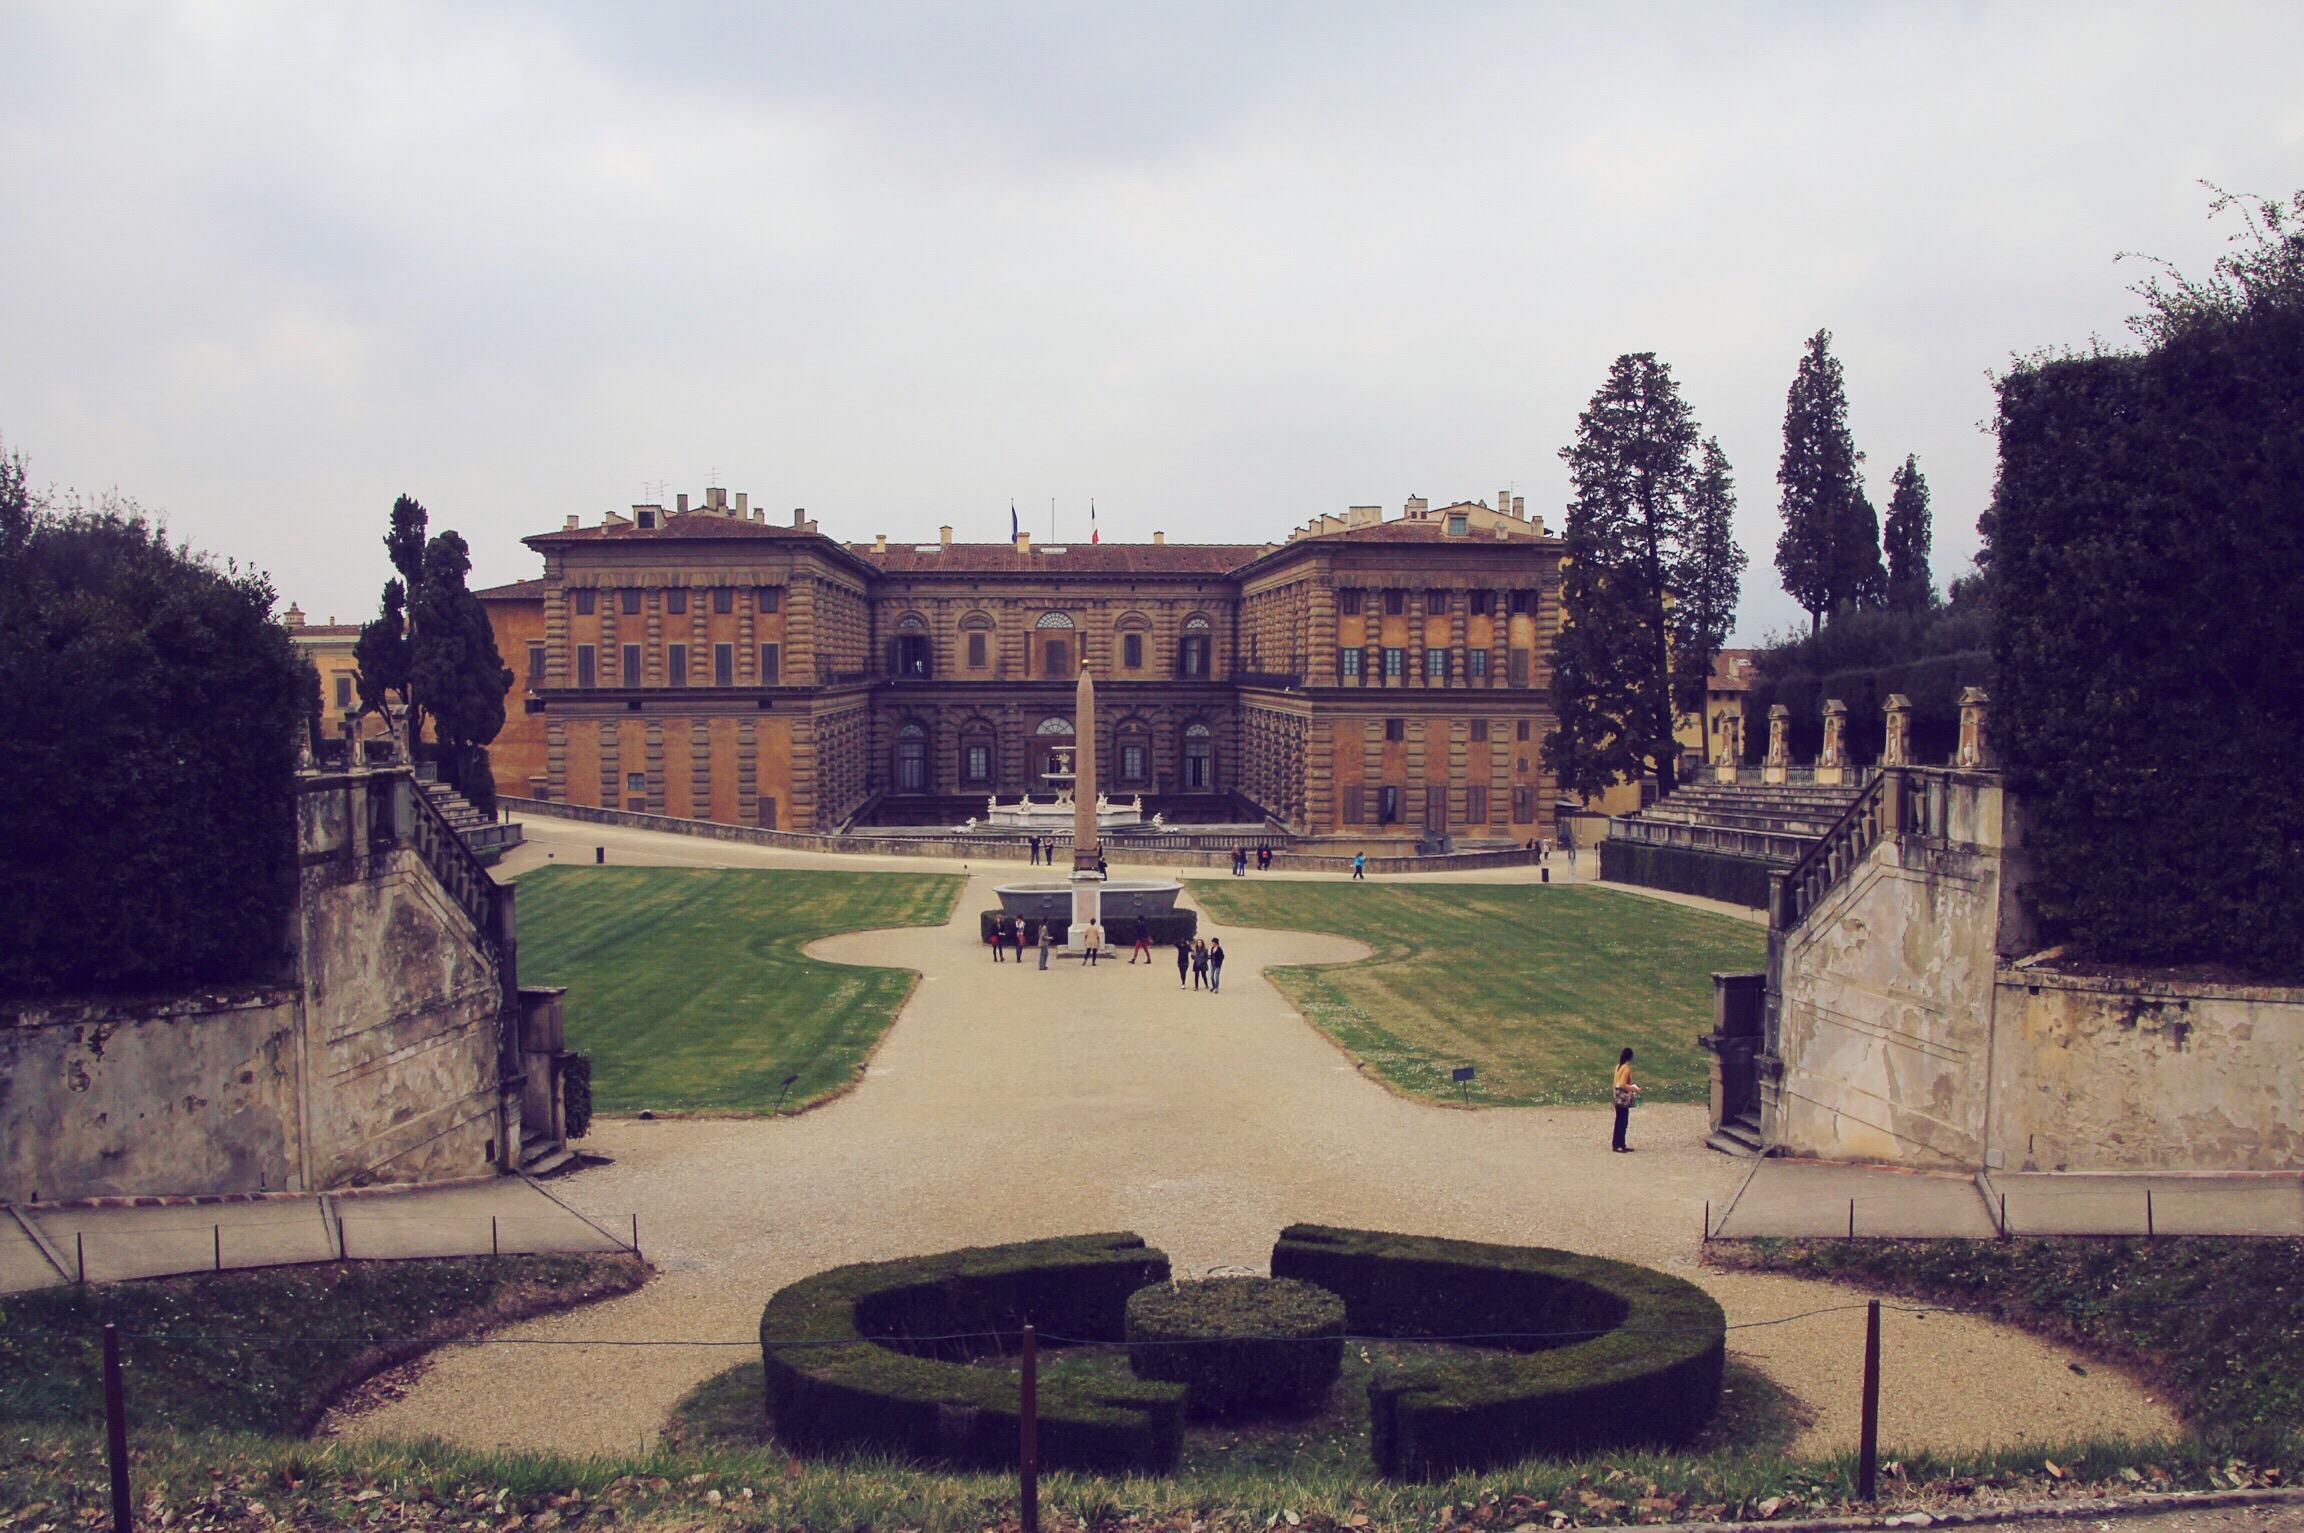 the renaissance Boboli Gardens of Florence Italy – off the beaten path